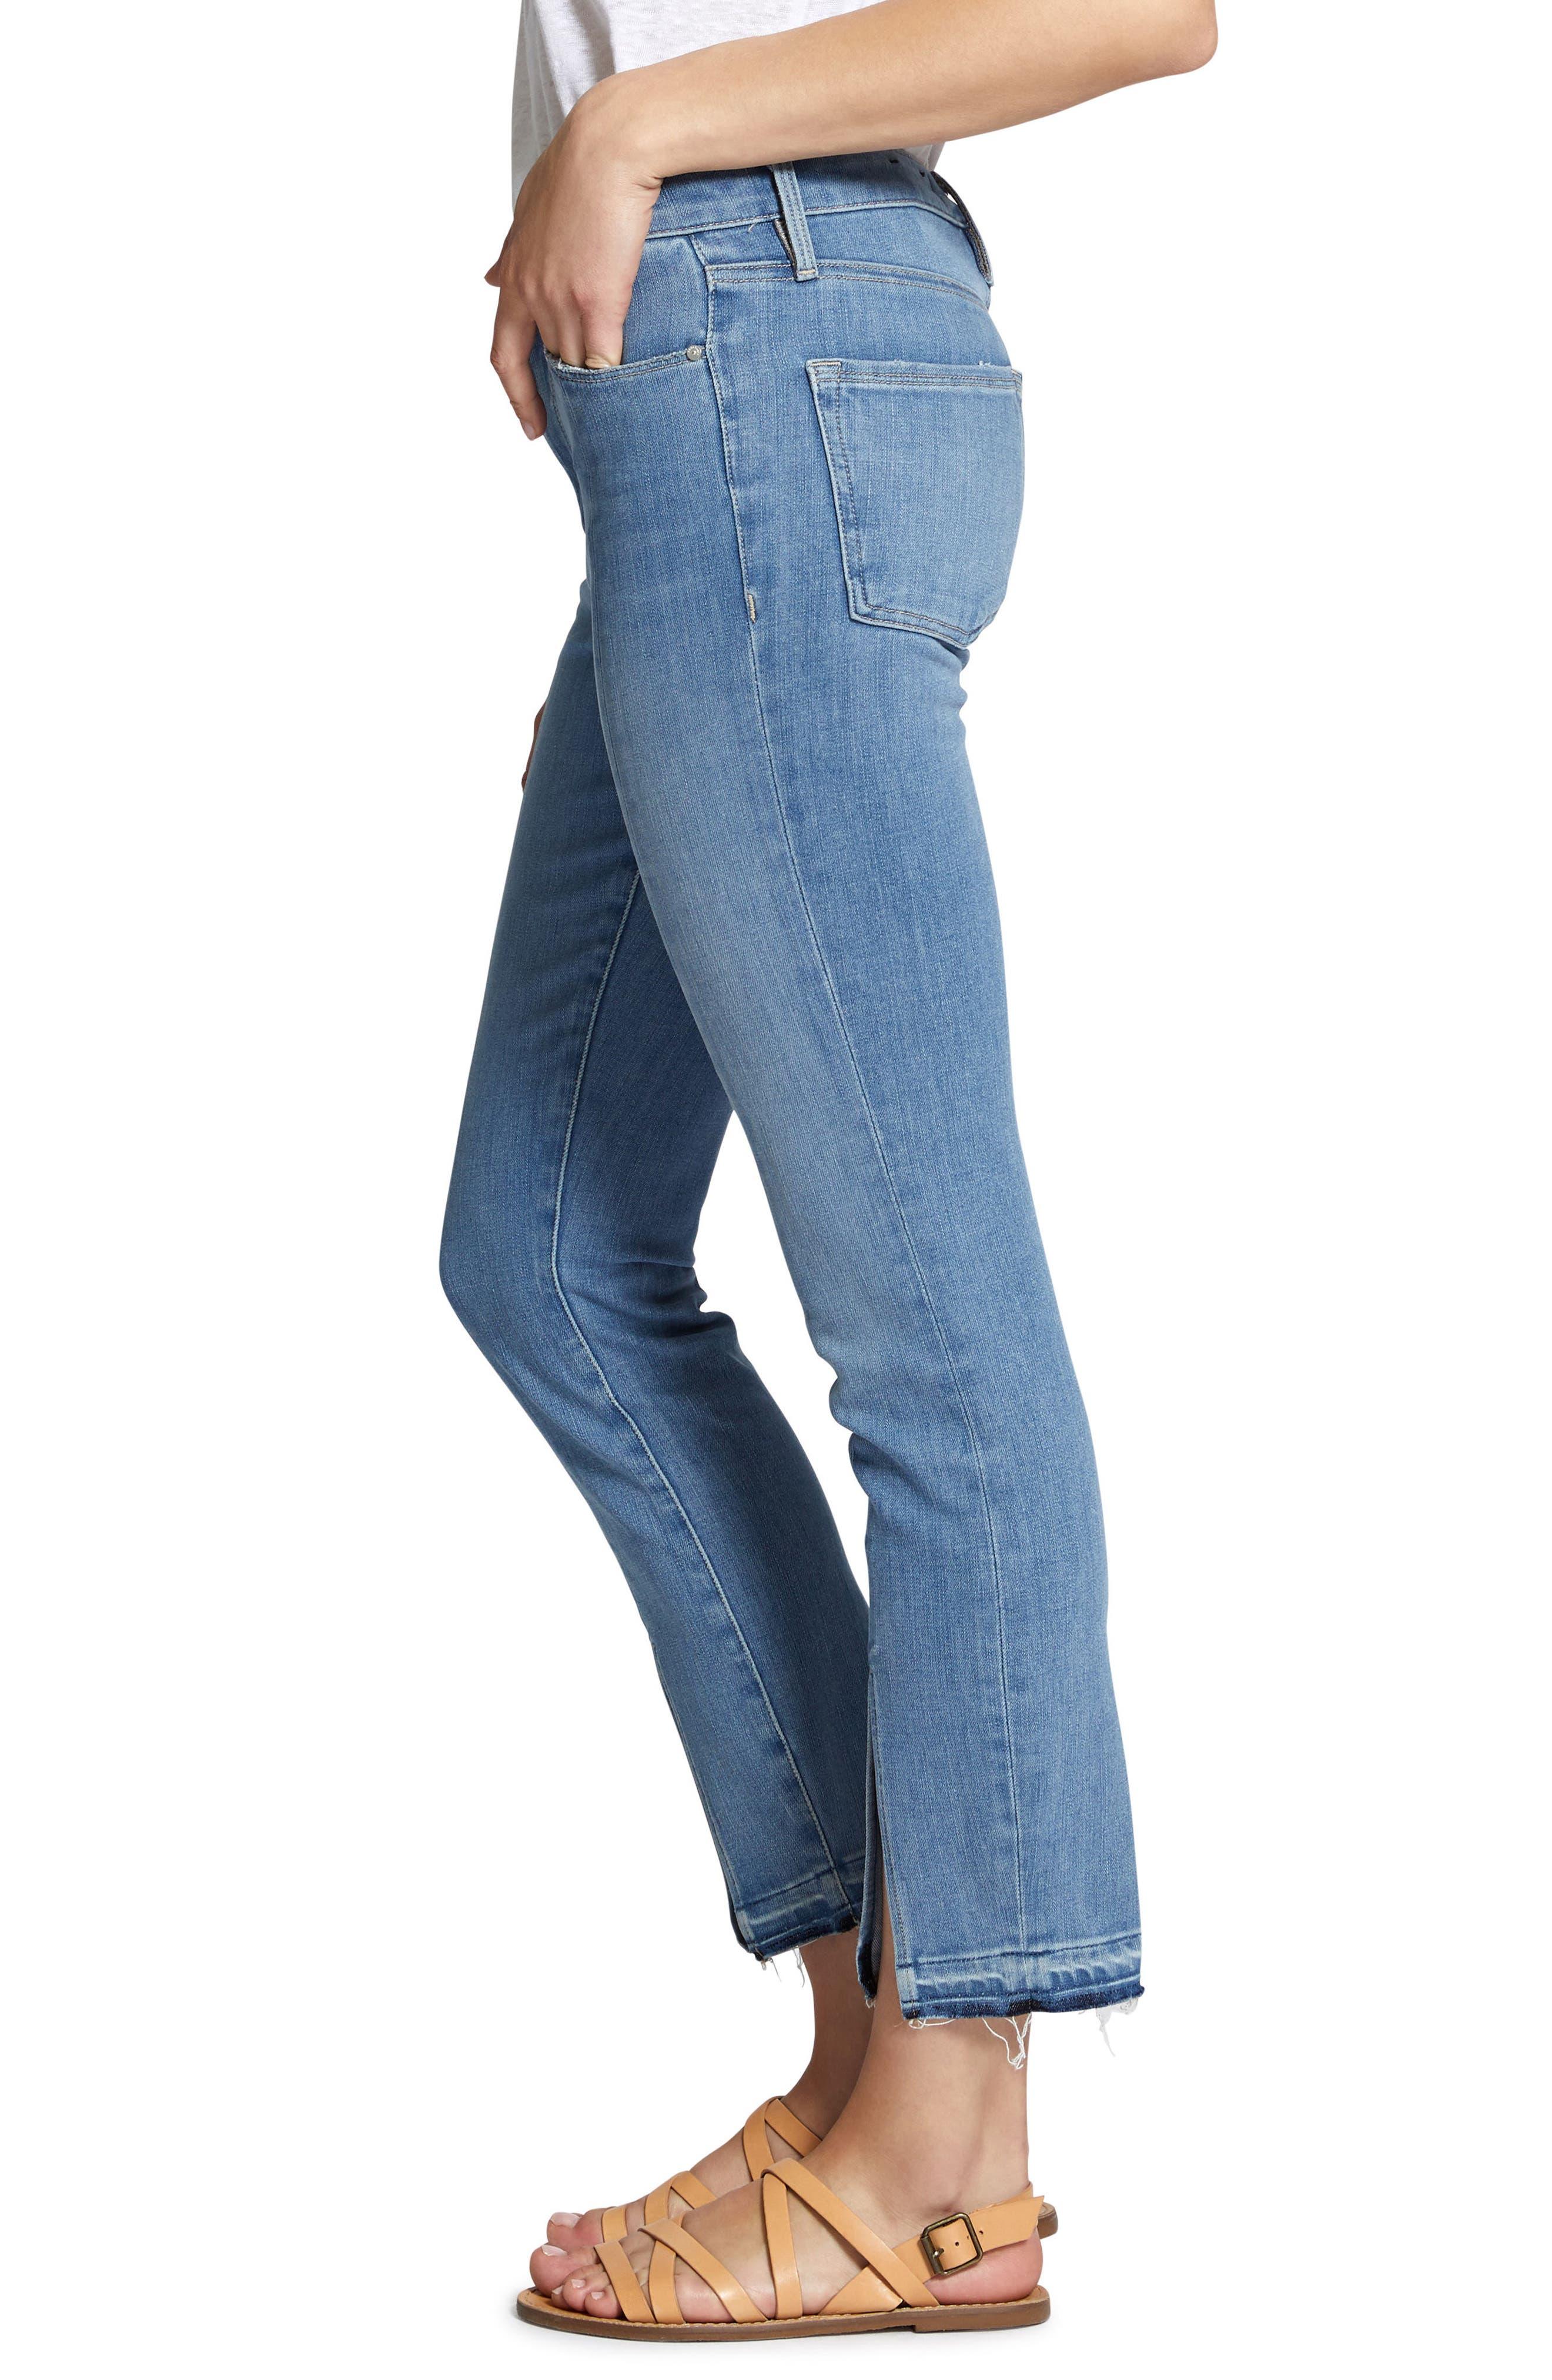 Robbie Spring Slit Jeans,                             Alternate thumbnail 3, color,                             421